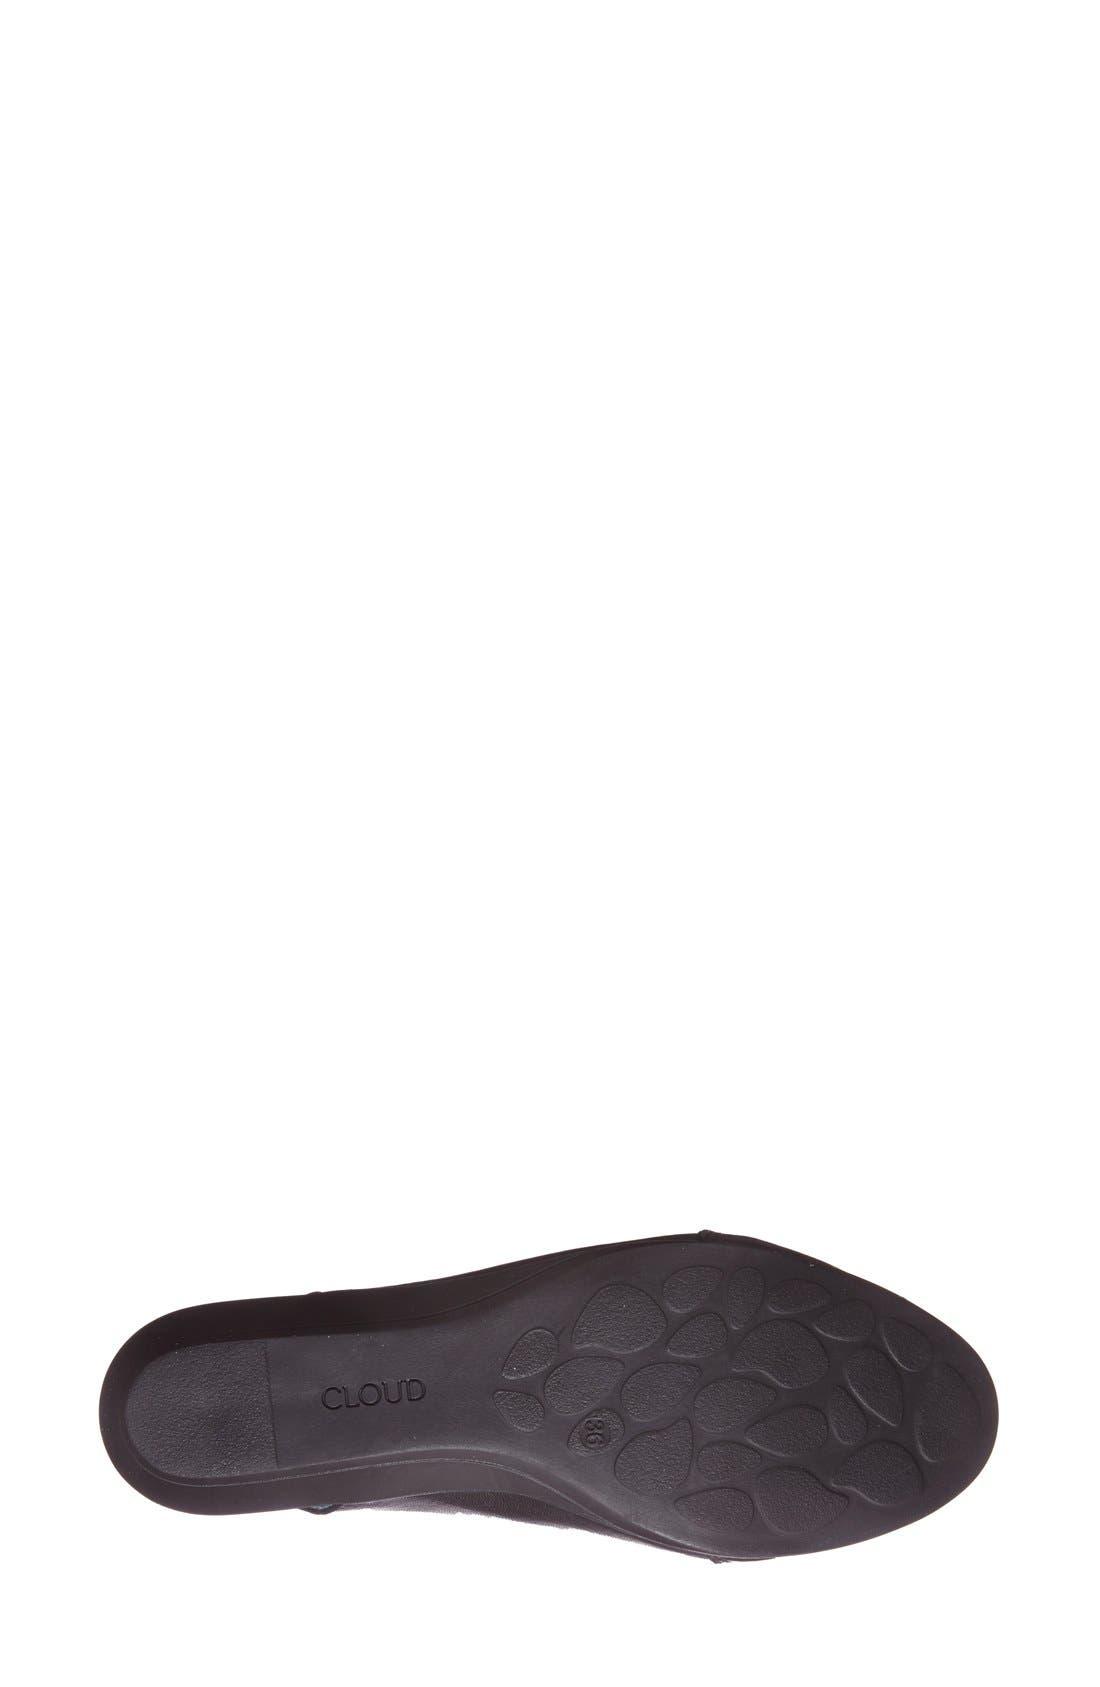 'Caliber' Peep Toe Leather Flat,                             Alternate thumbnail 4, color,                             Black